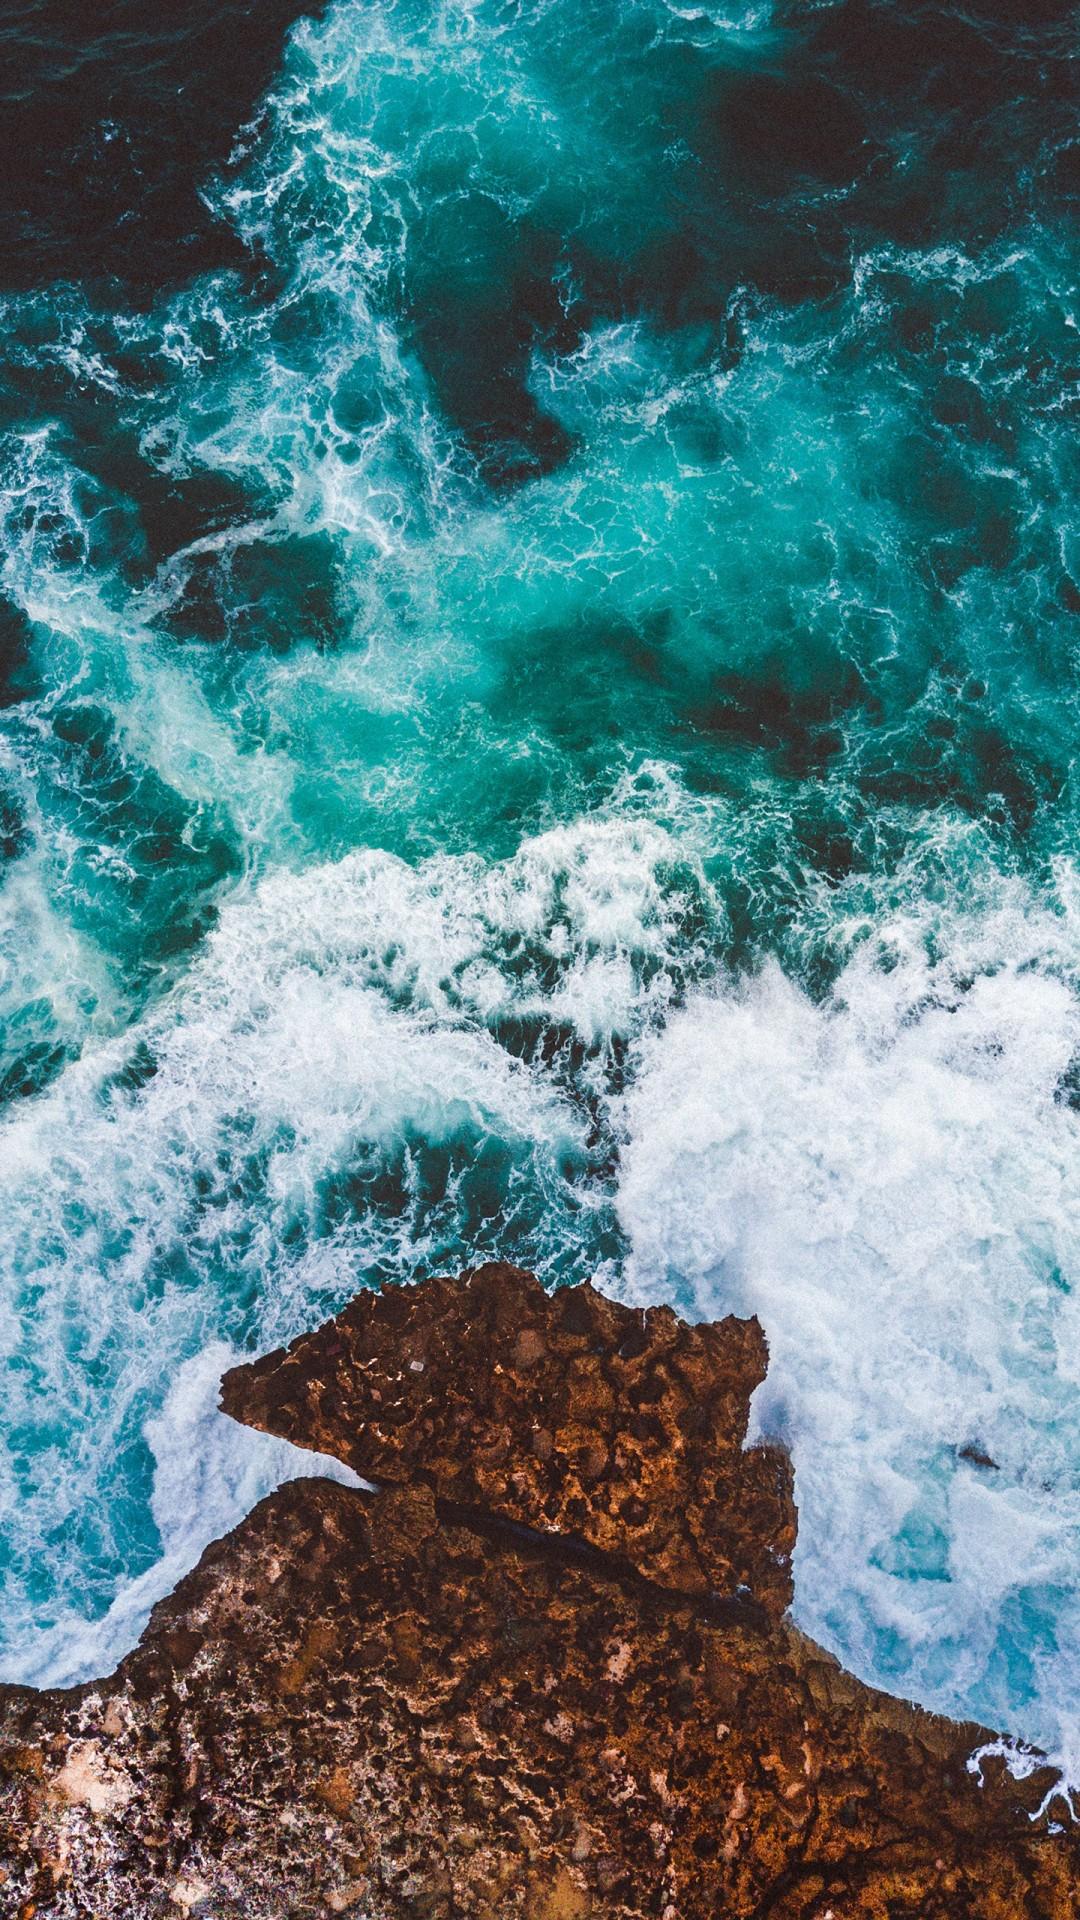 Falling Water Wallpaper Hd Ocean Cliff Drone View 4k Wallpapers Hd Wallpapers Id